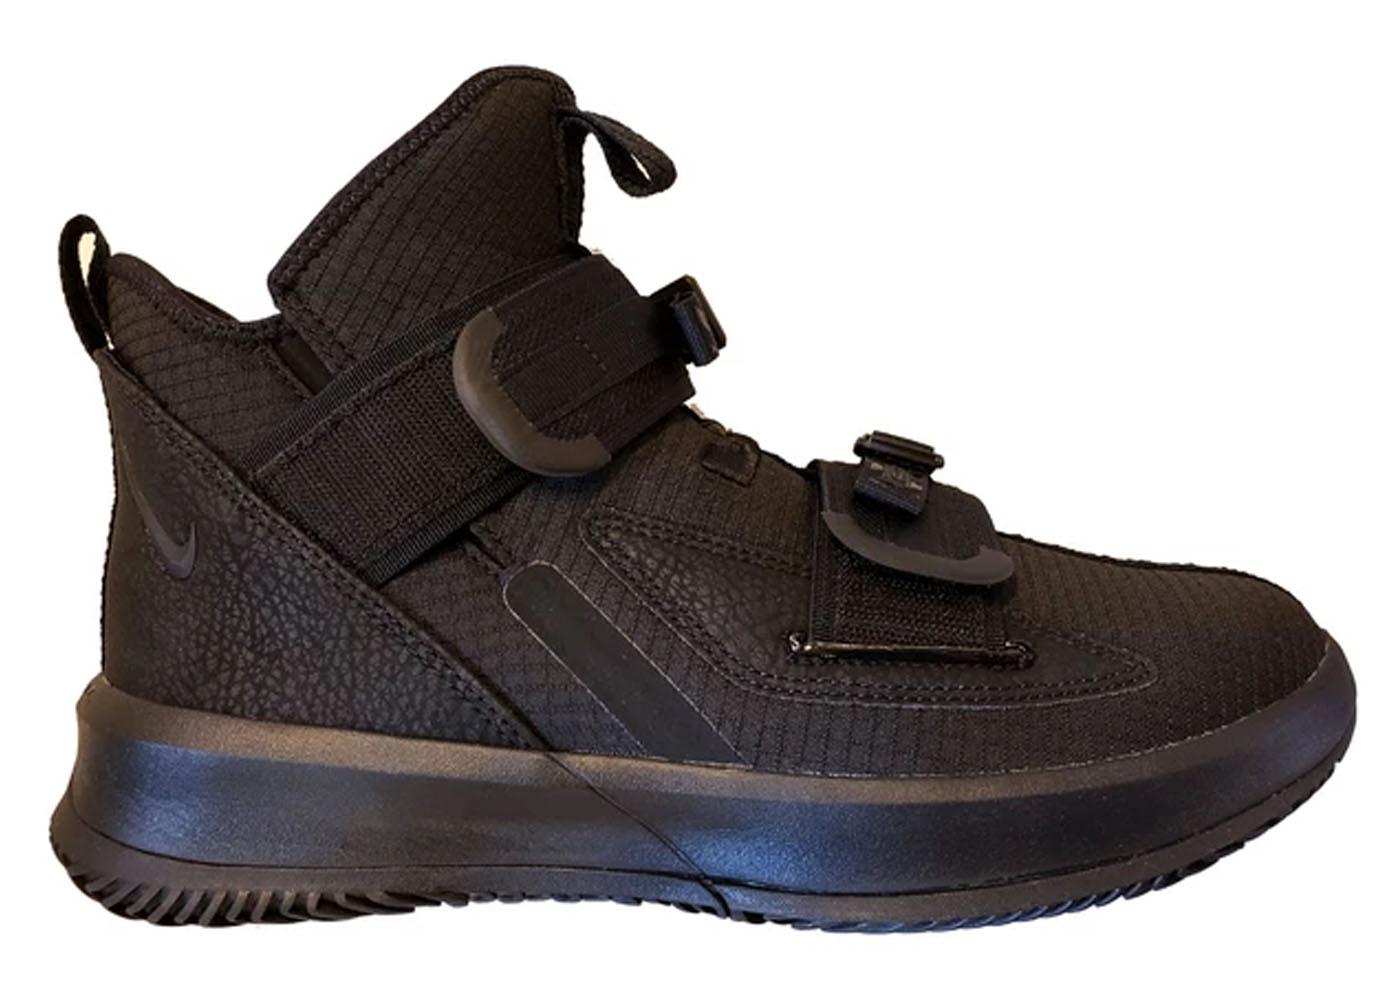 Nike LeBron Soldier 13 SFG Triple Black